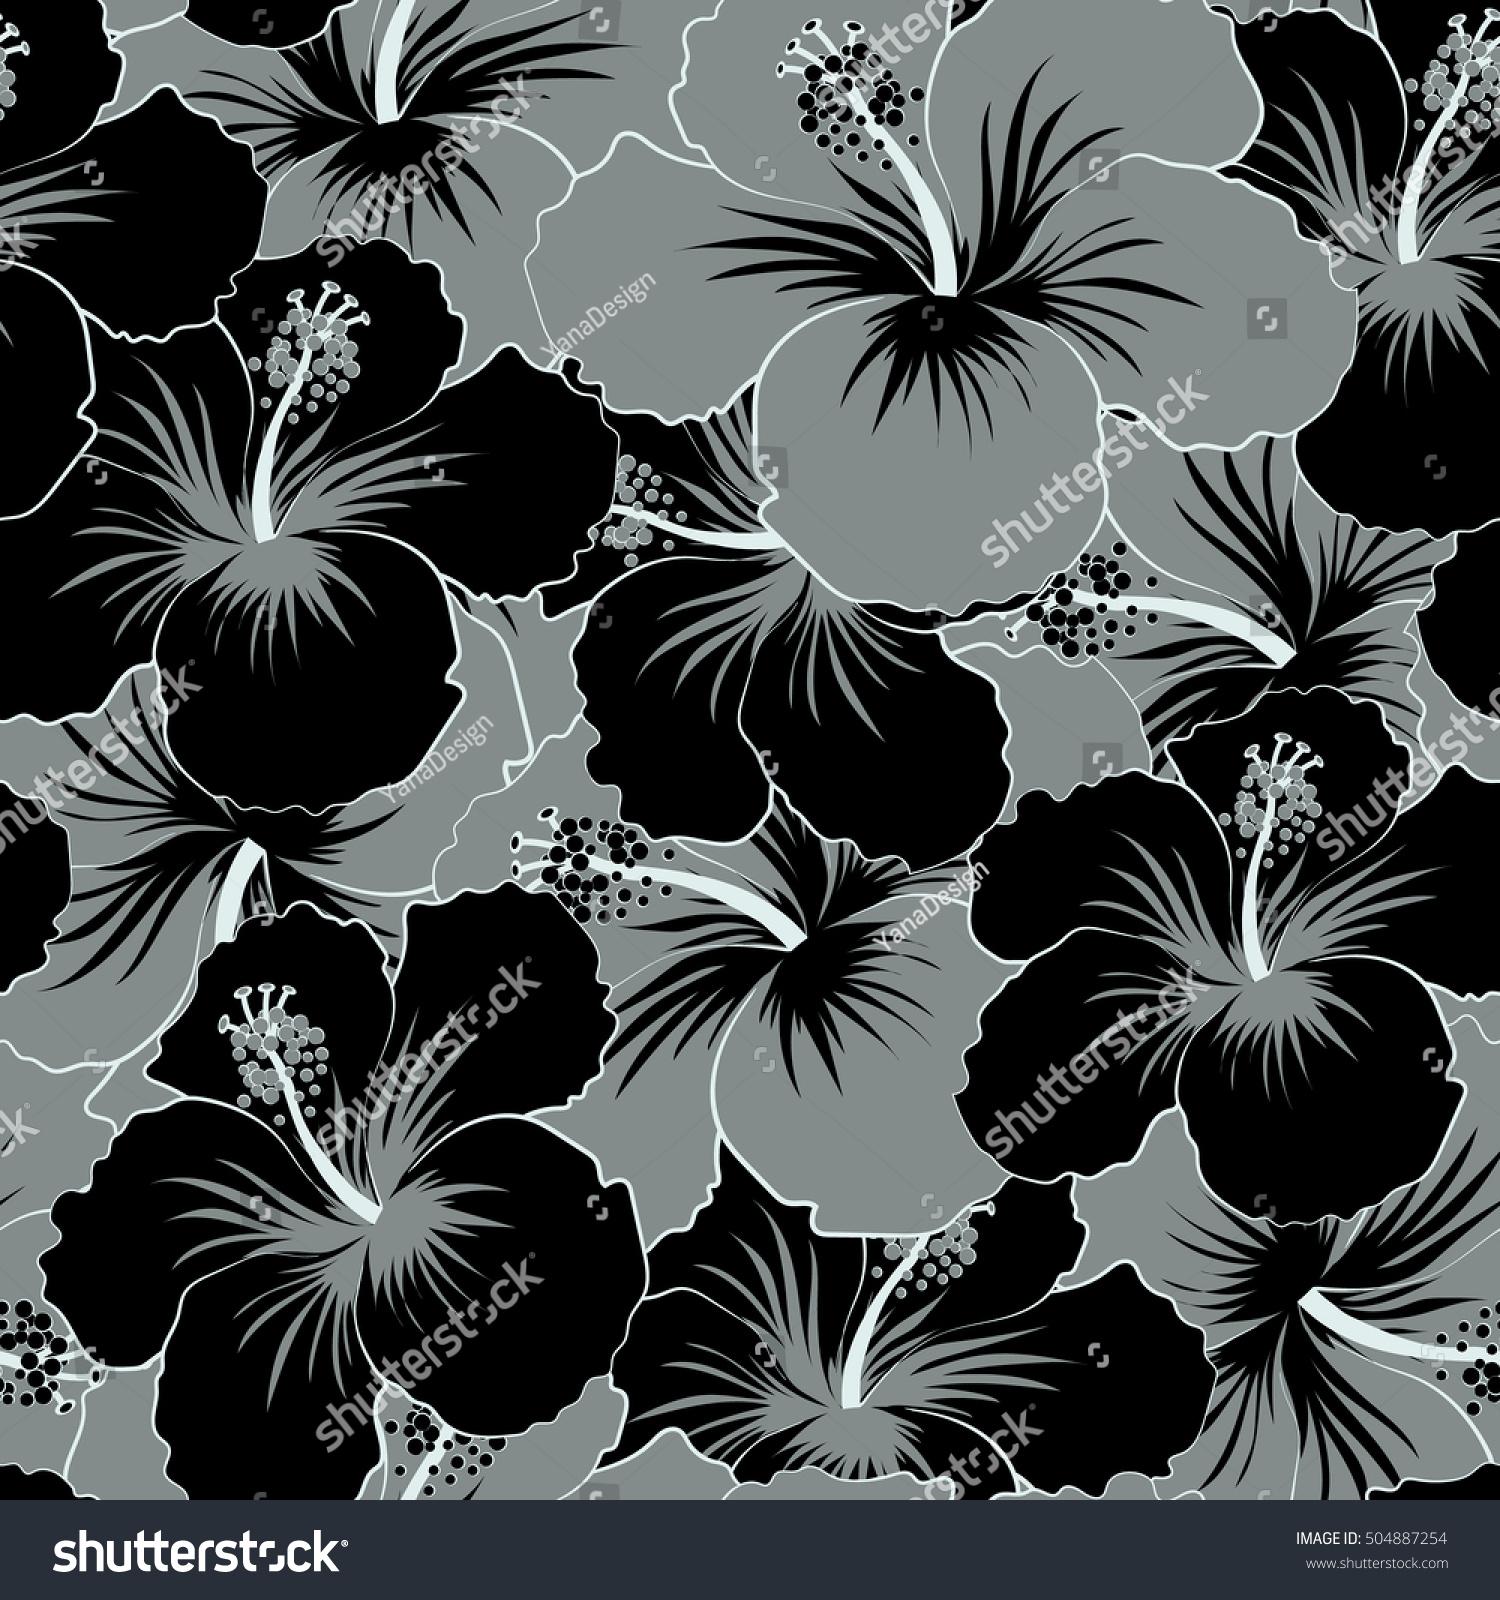 Aloha Hawaiian Shirt Seamless Hibiscus Pattern In Black And Gray